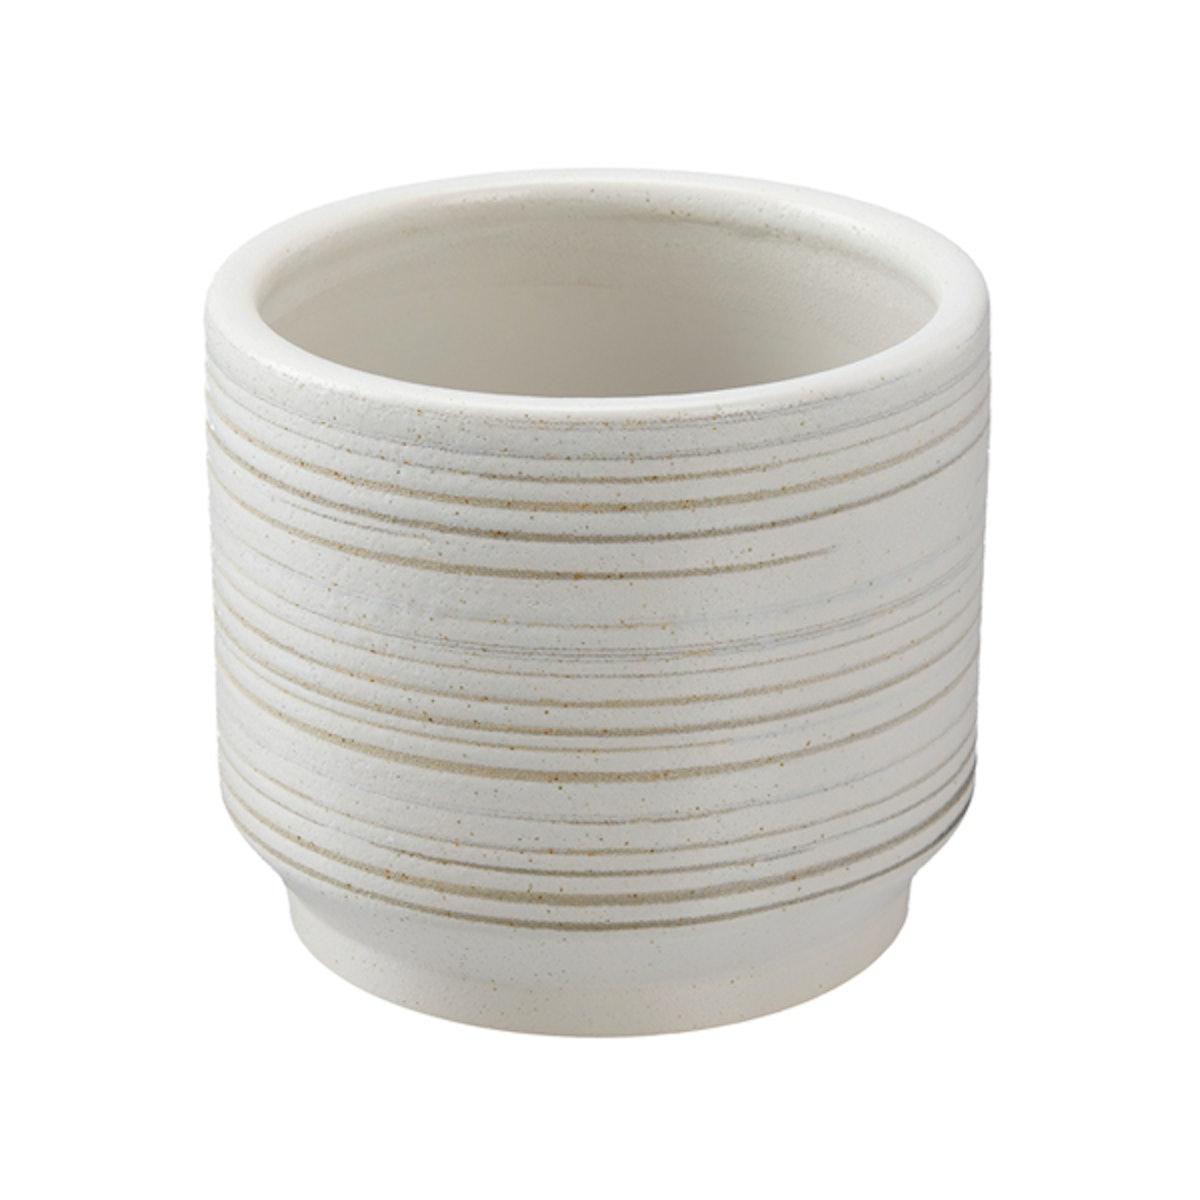 "6"" Teramo Round Ceramic Planter, White"